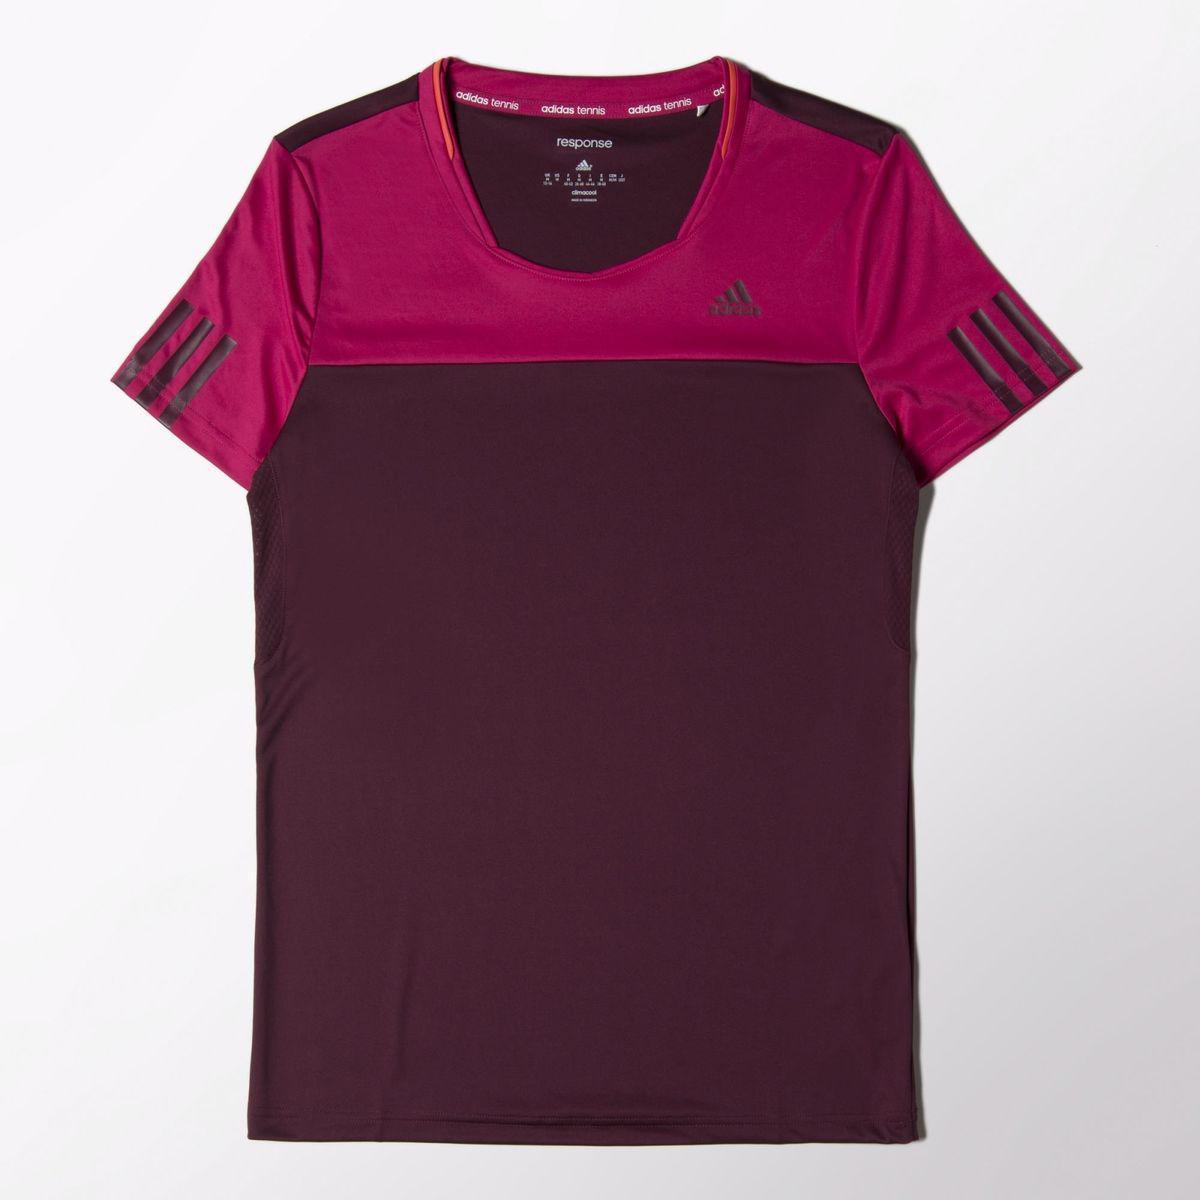 4119cbc9eaf7e Adidas Womens Response Tee - Amazon Red/Bold Pink